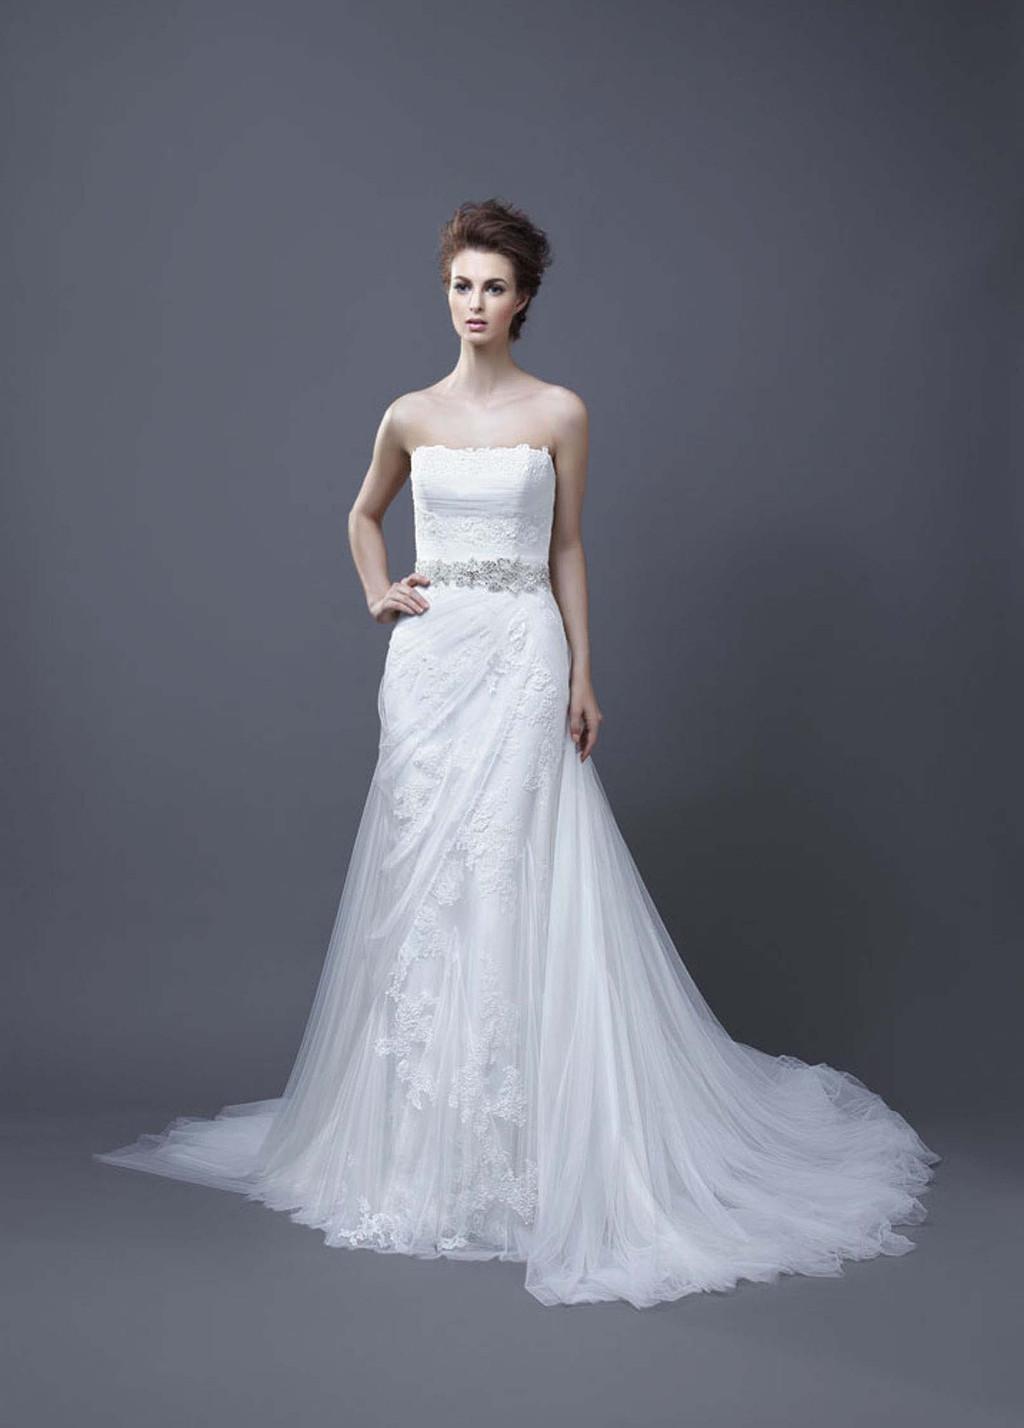 2013-wedding-dress-by-enzoani-bridal-helen.full